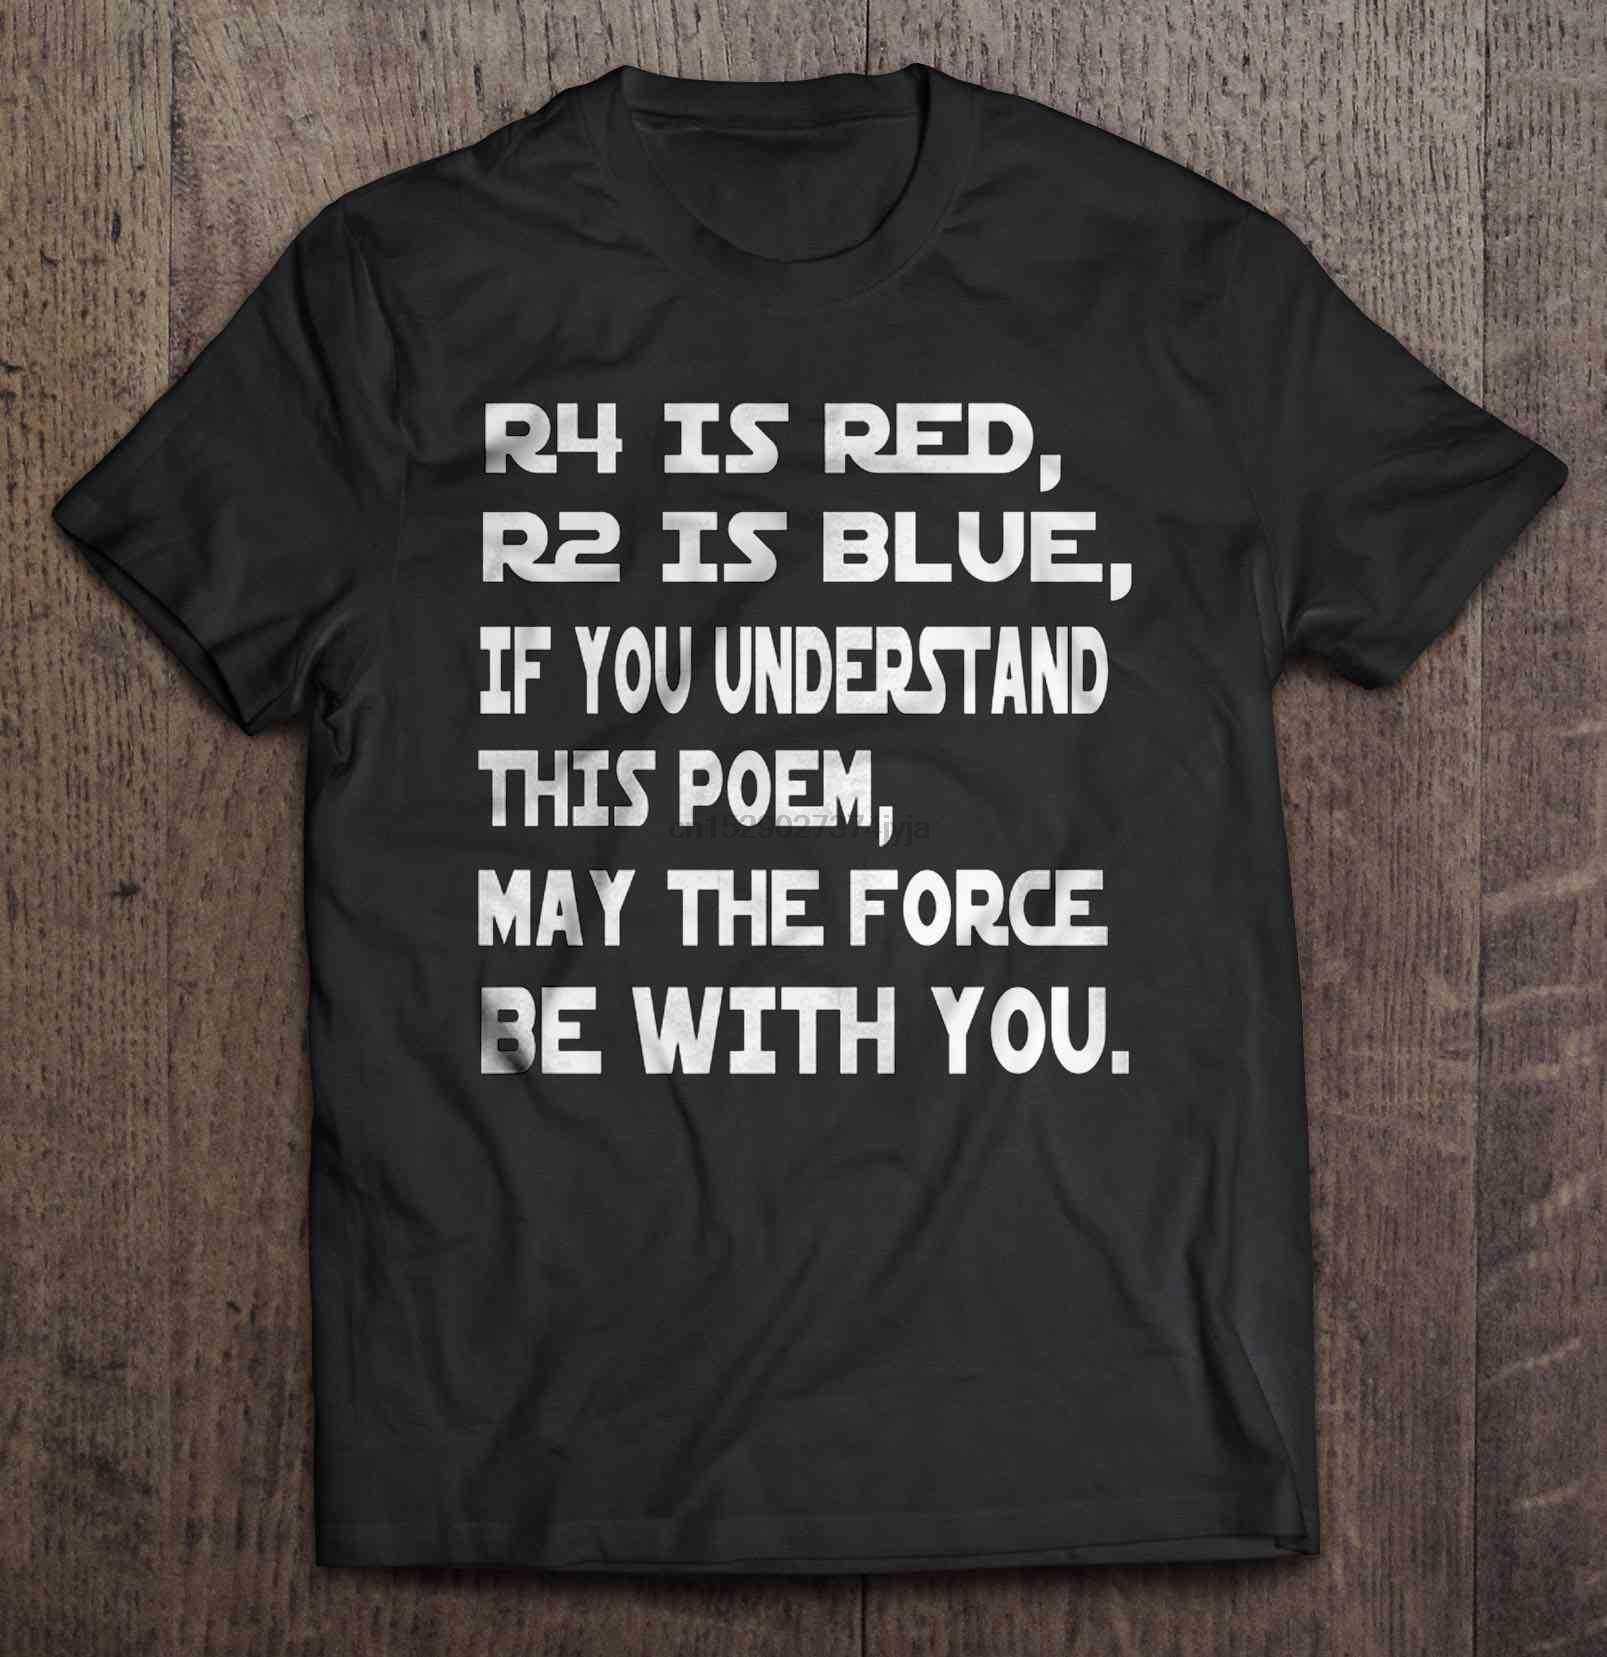 Mannen Grappige T-shirt Fashion T-shirt R4 Is Rood R2 Is Blauw Als U Begrijpen Dit Gedicht Kan De Kracht worden Met U Vrouwen T-shirt